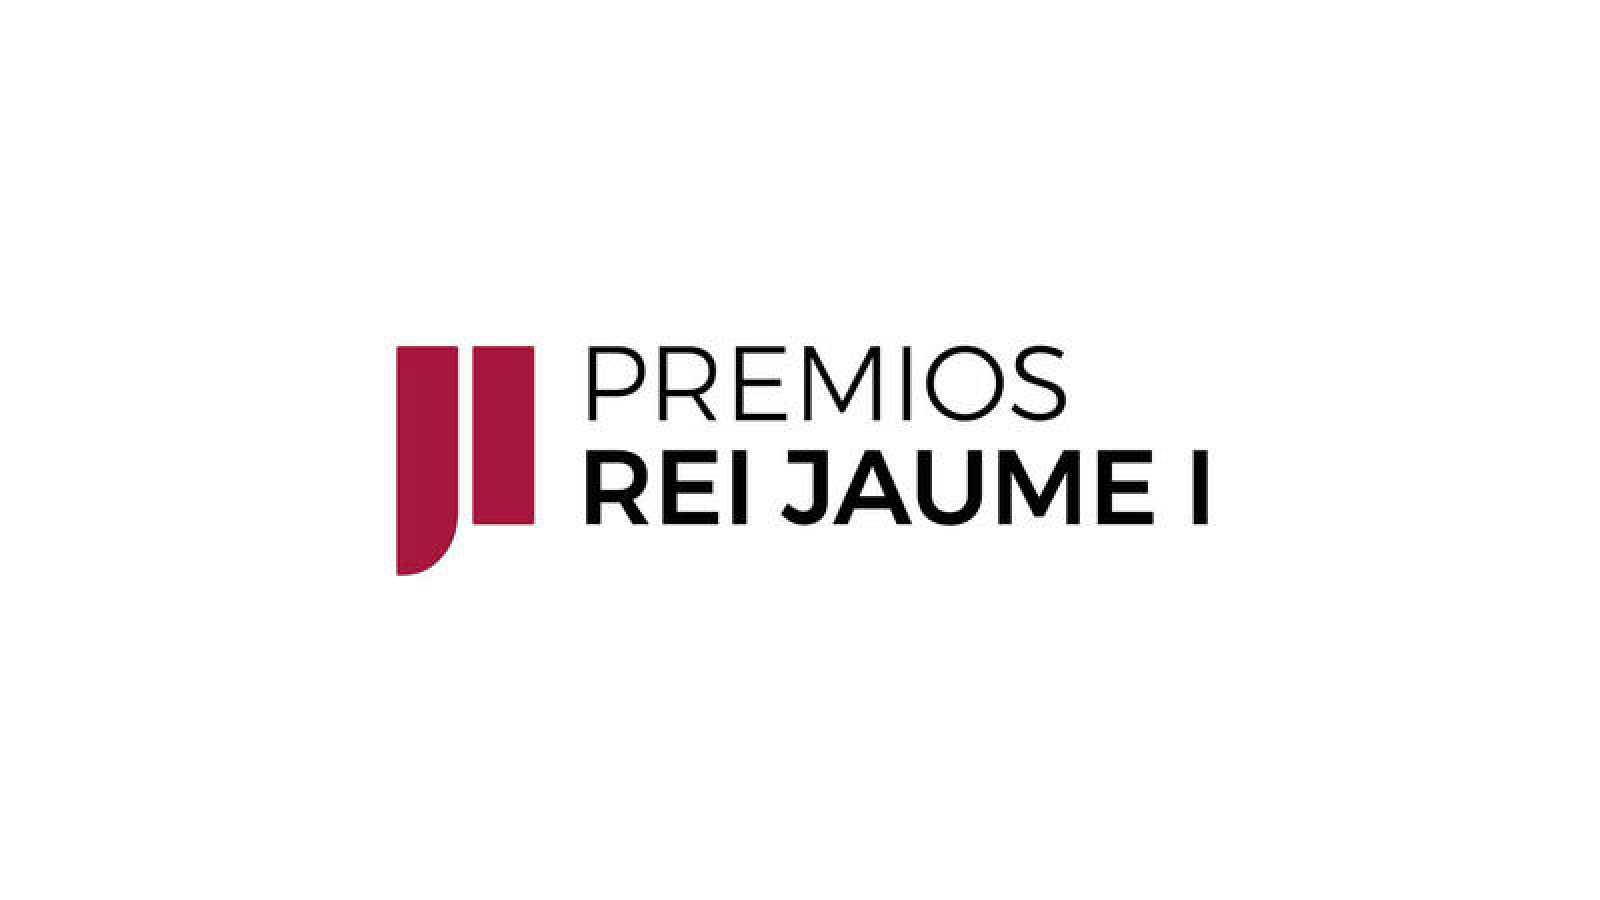 Fundación Premios Rei Jaime I